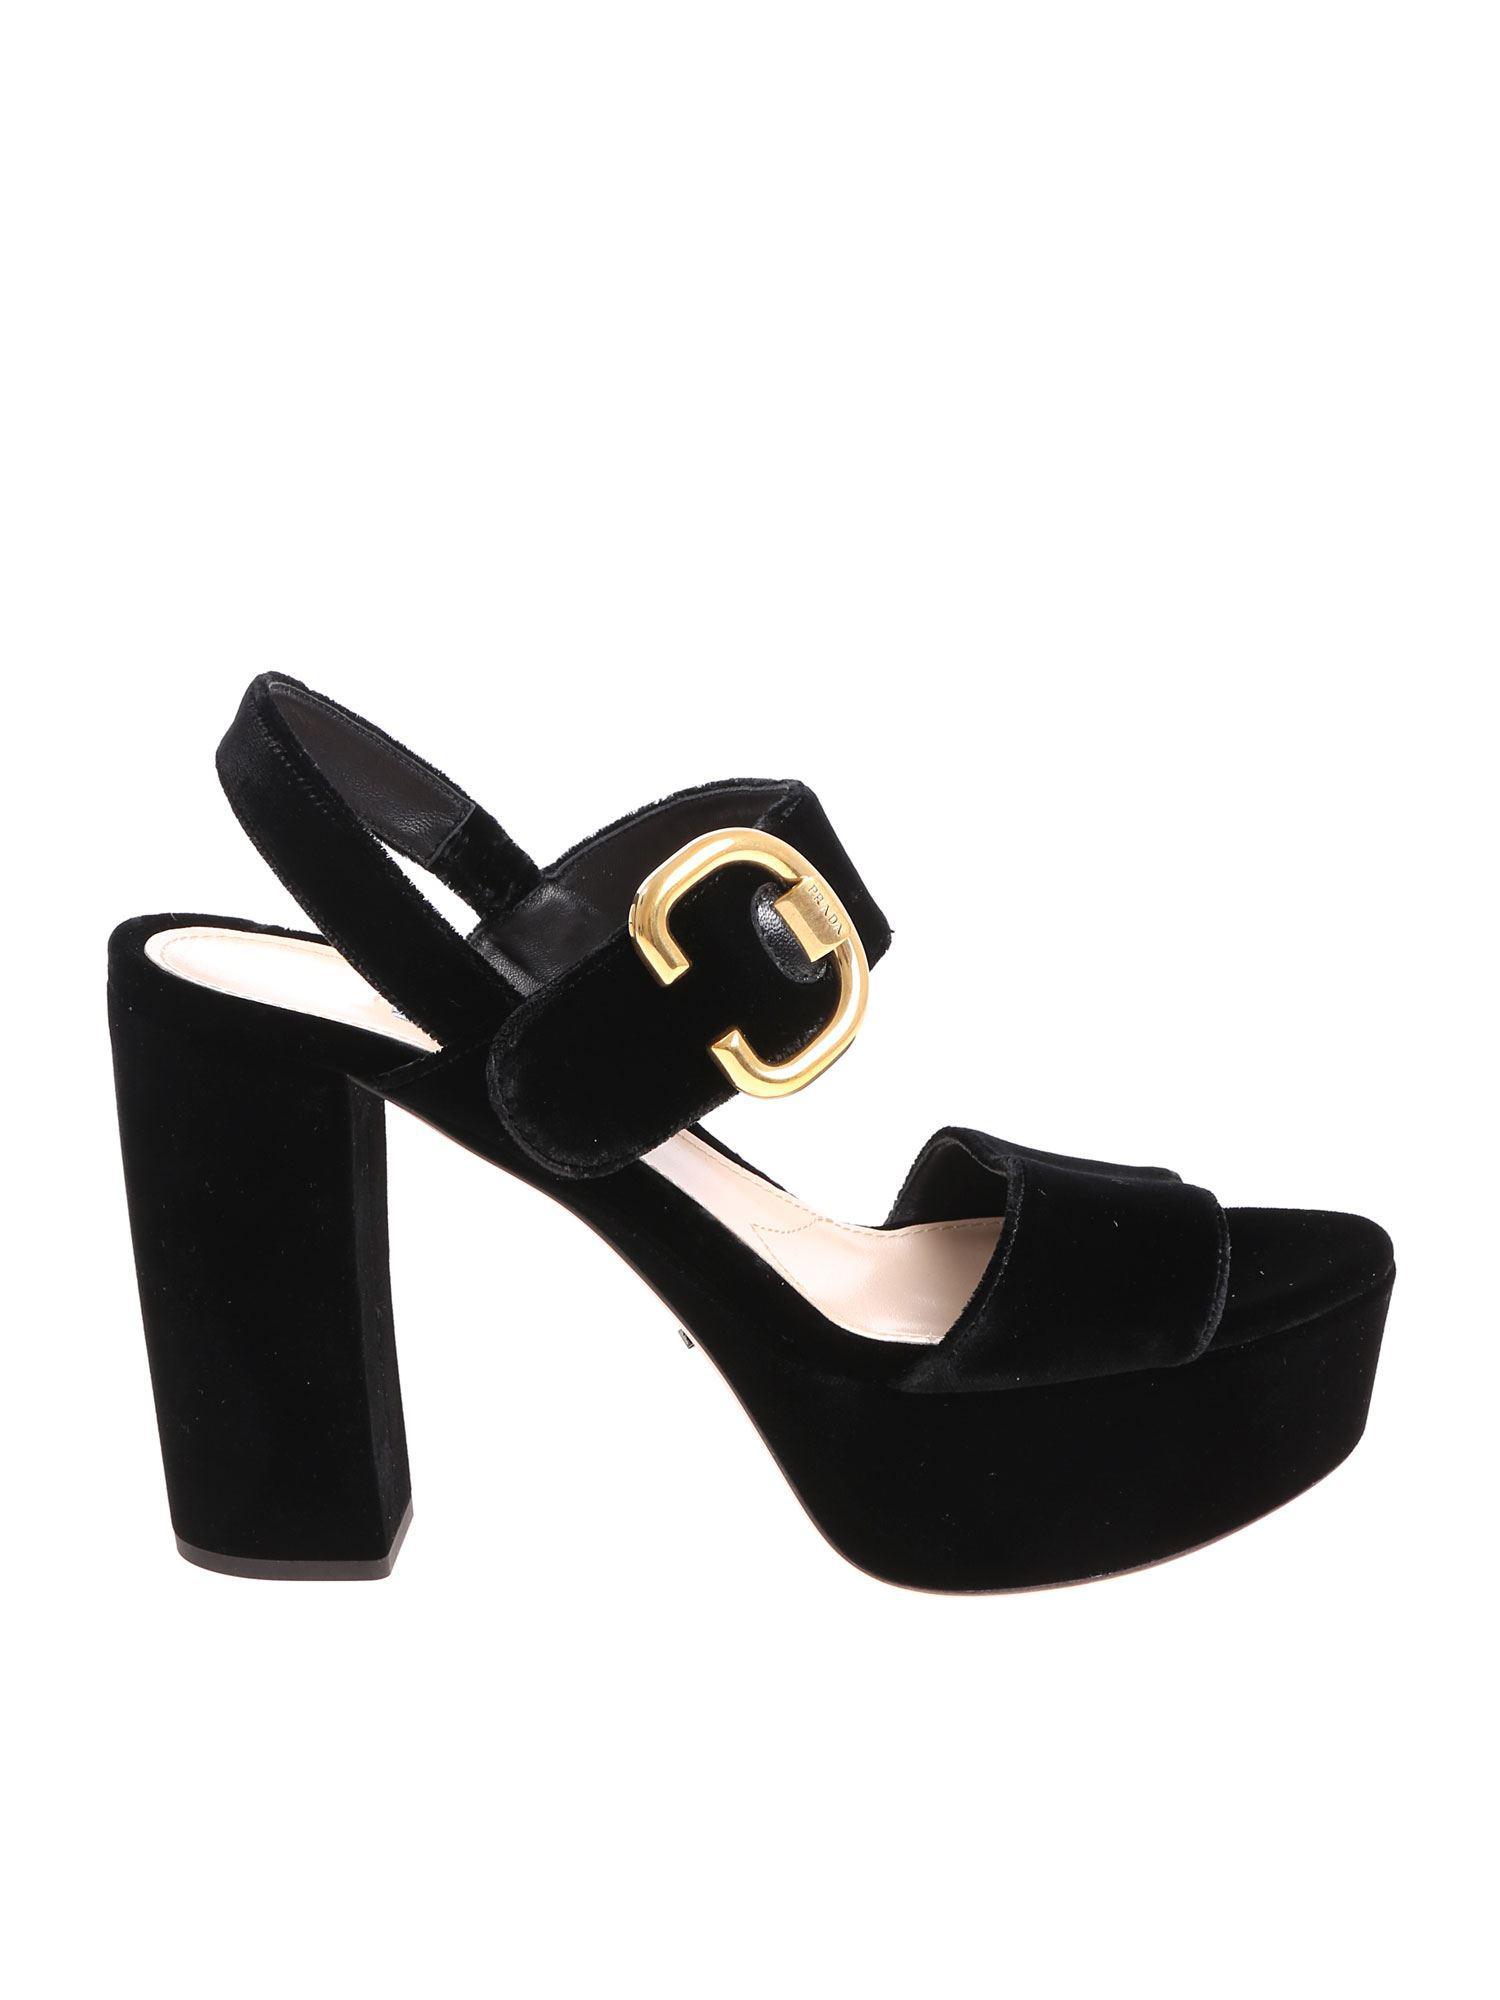 44a4a8d33318 Lyst - Prada Black Velvet Sandals in Black - Save 29%